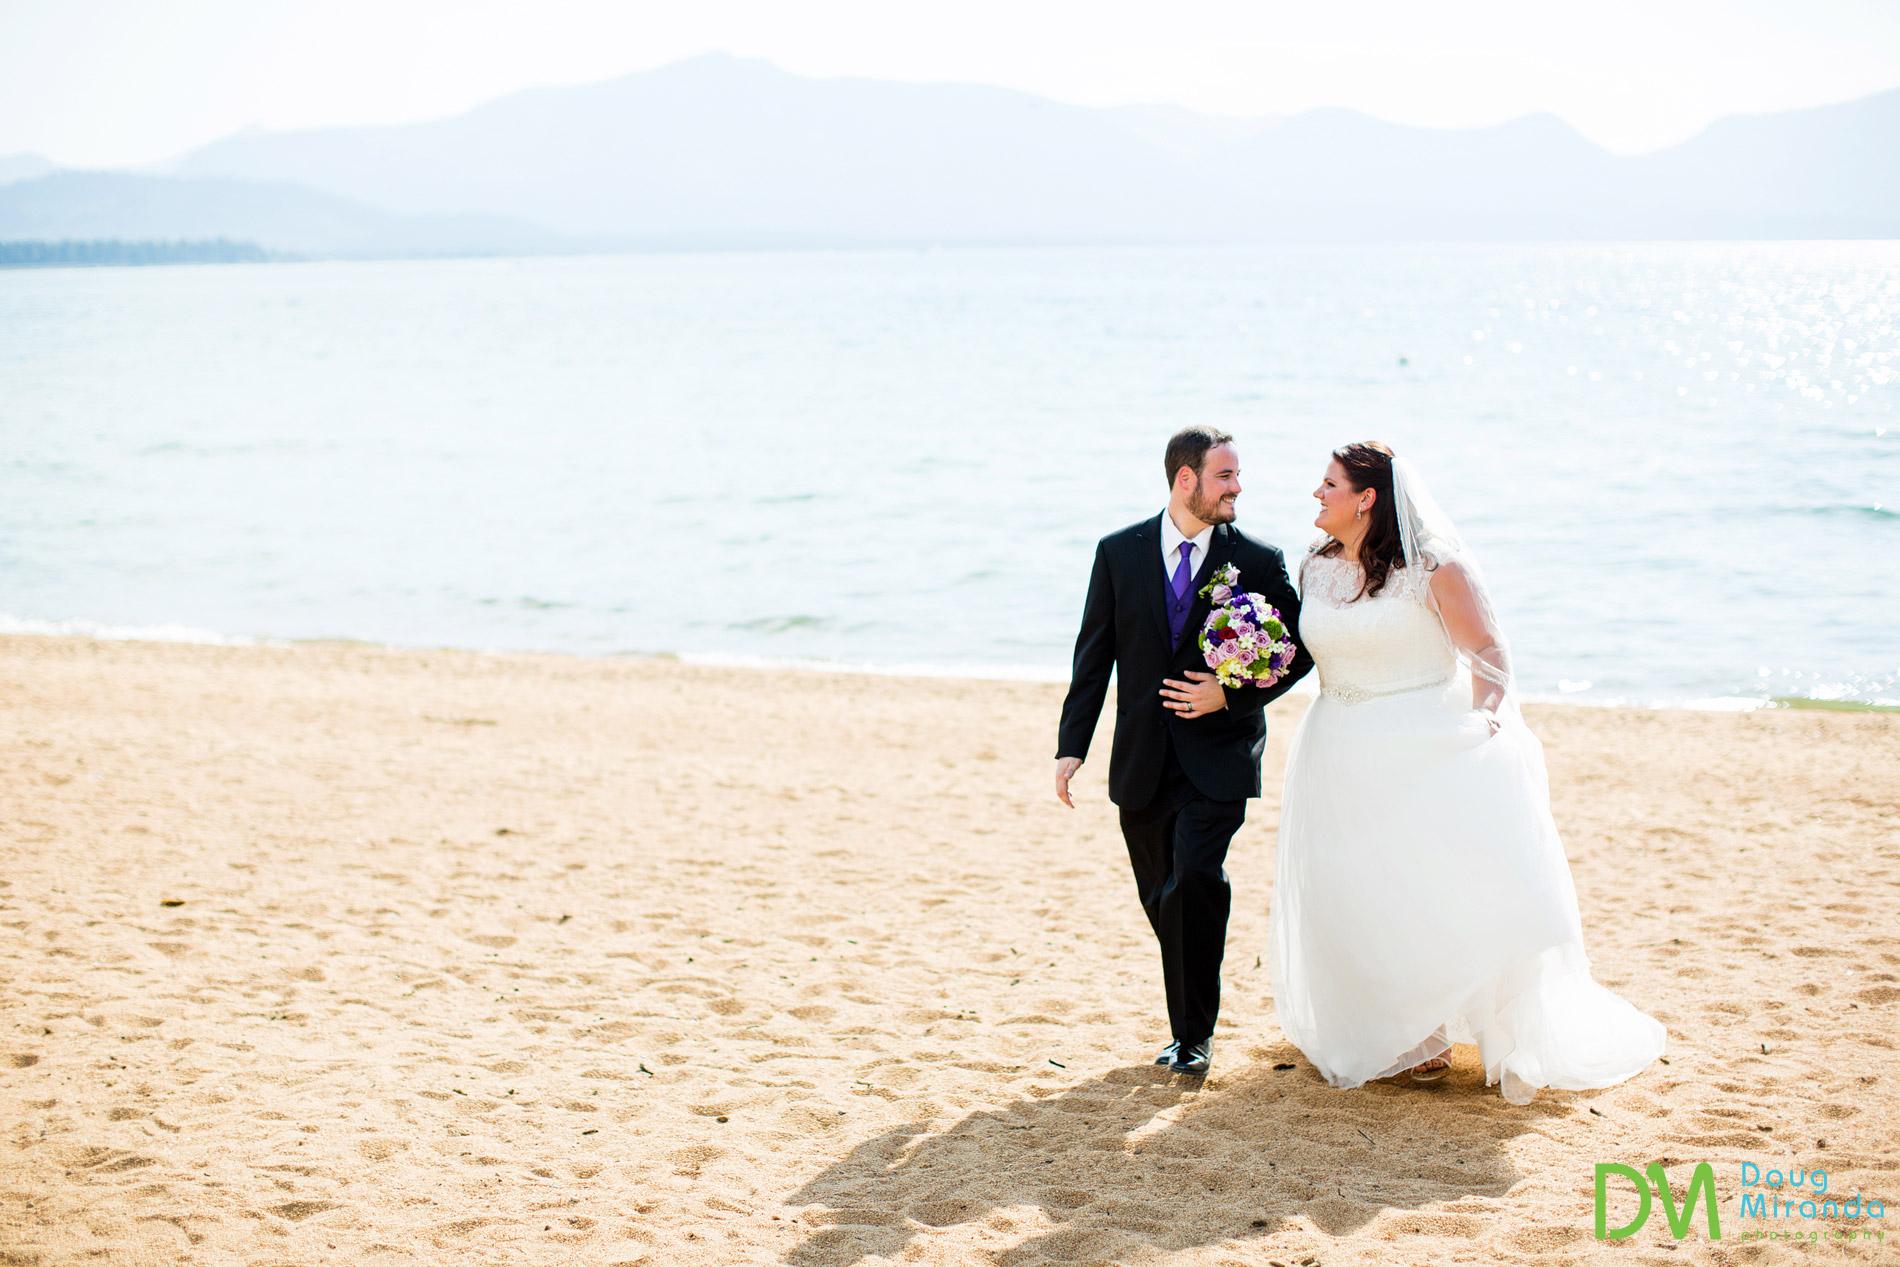 edgewood golf course wedding photos